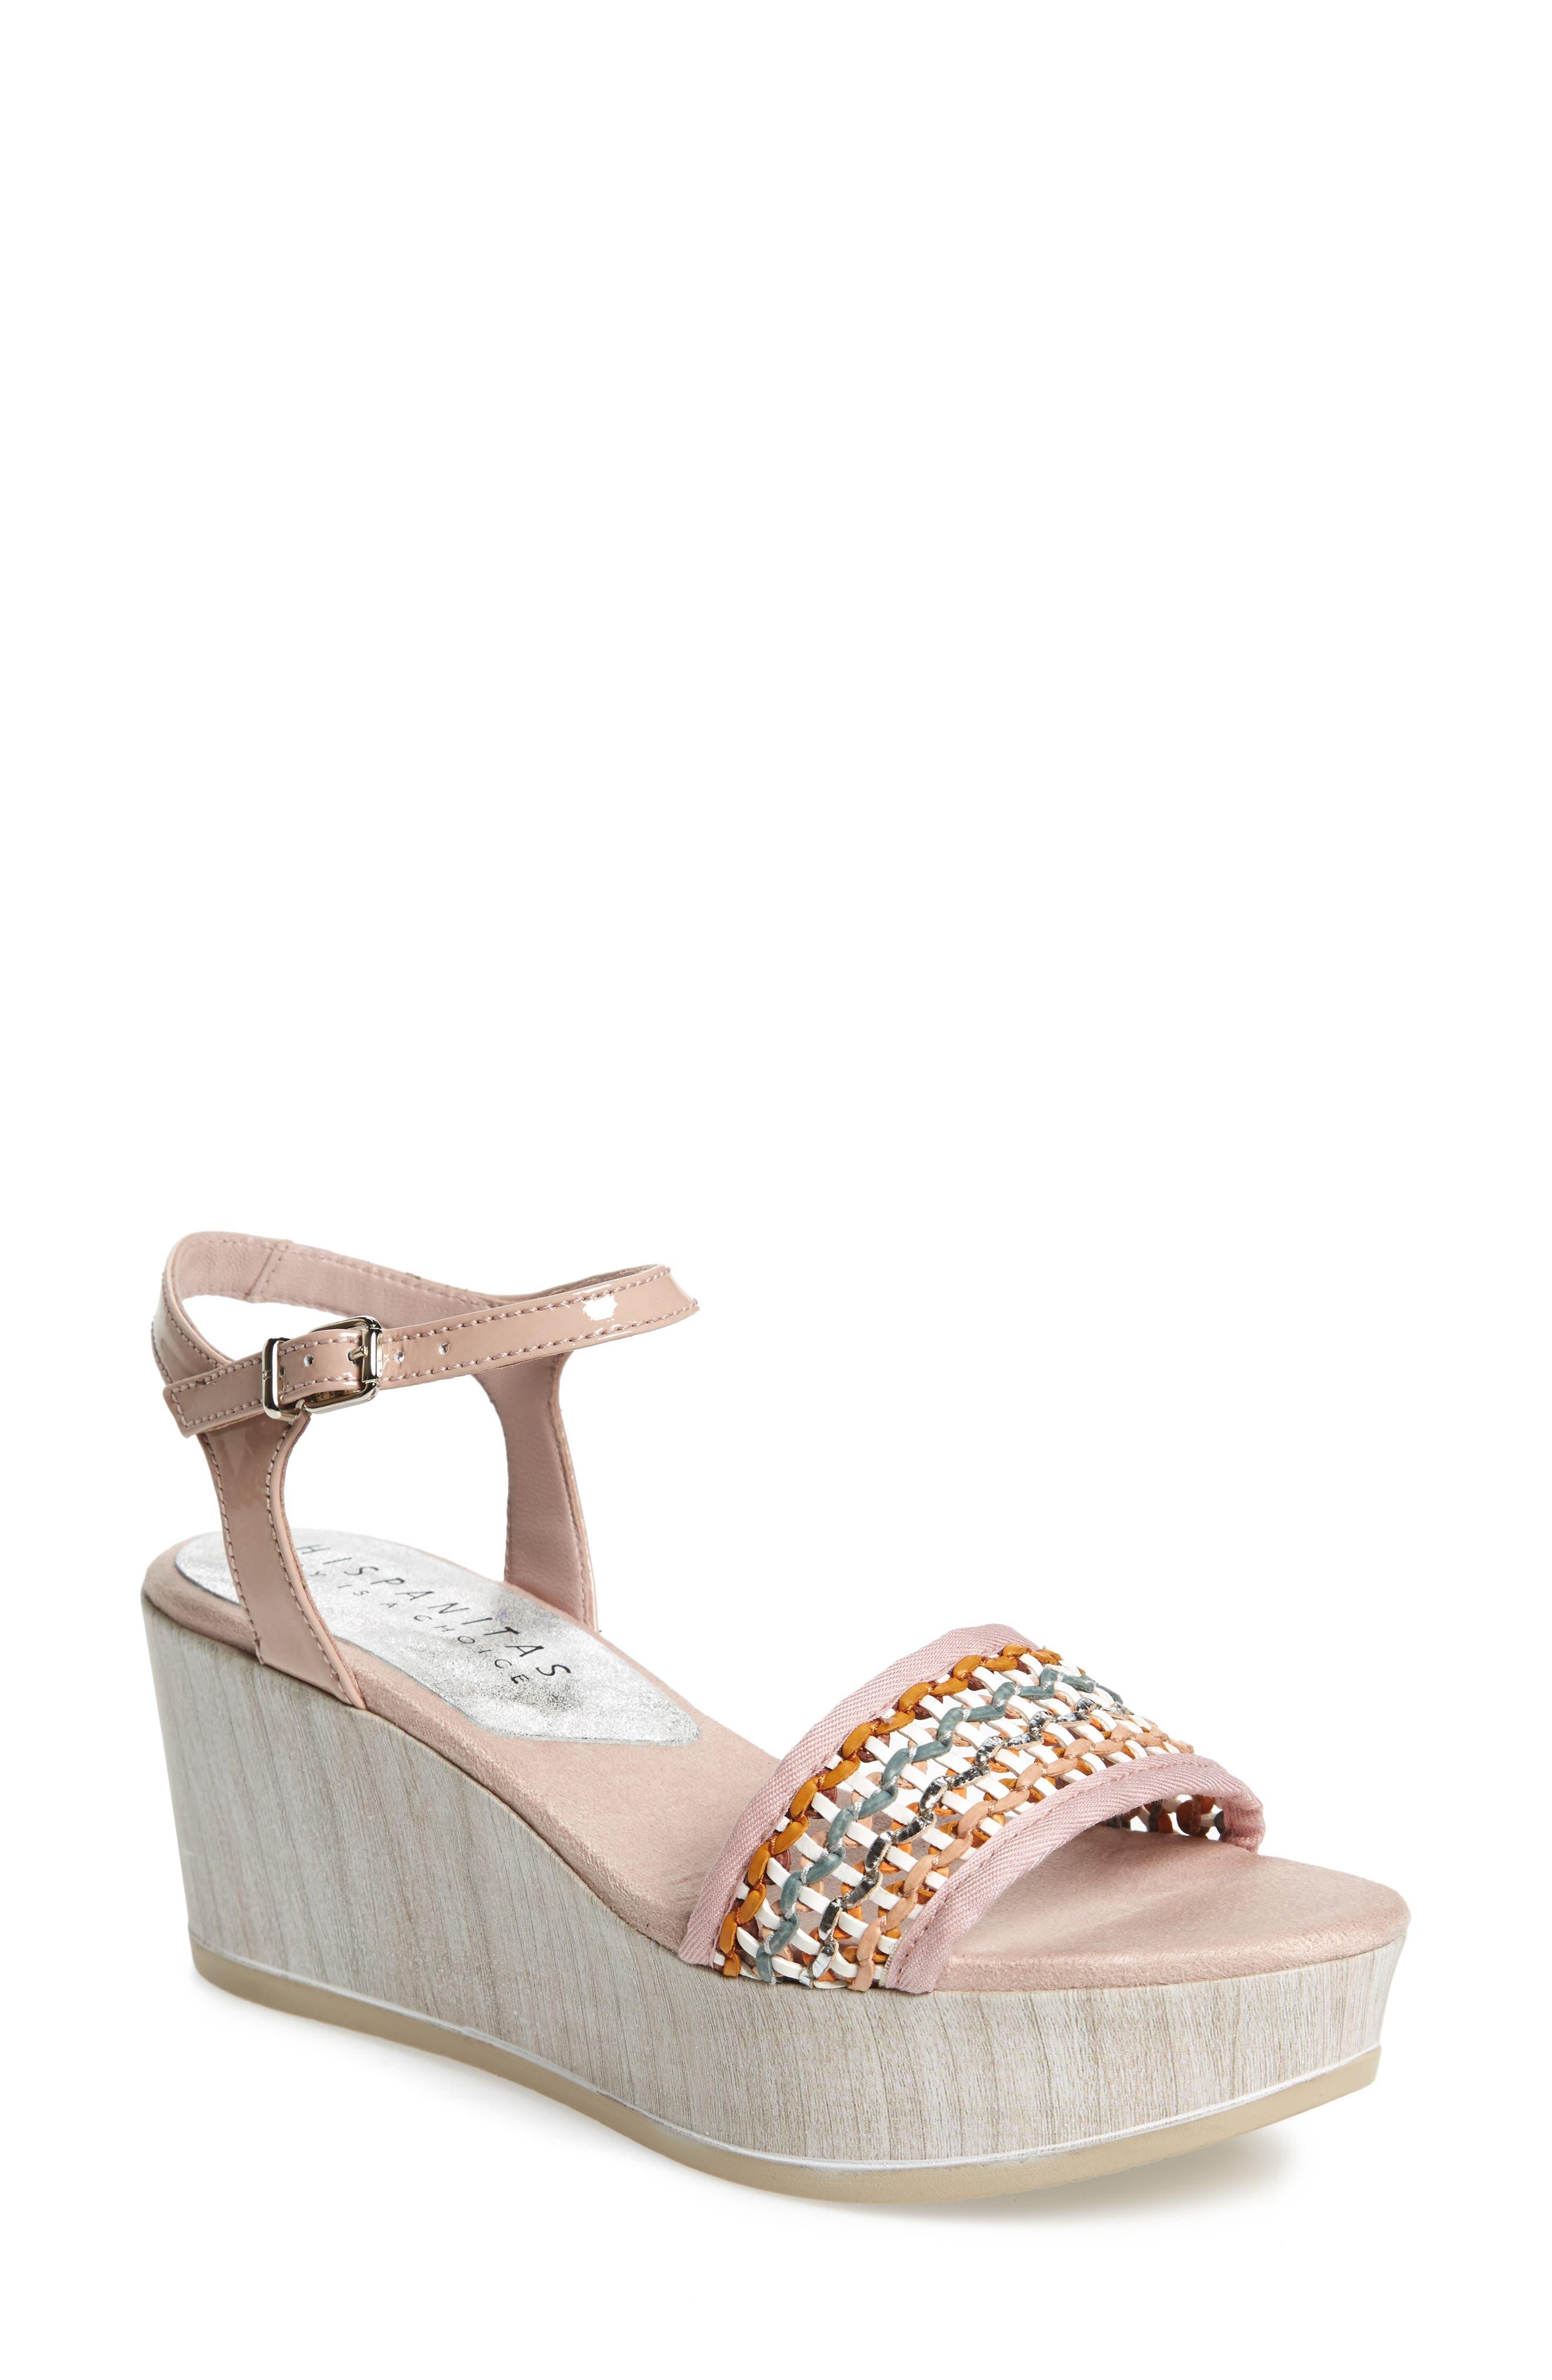 Colbi Platform Wedge Sandal,                         Main,                         color, Amalfittana Leather